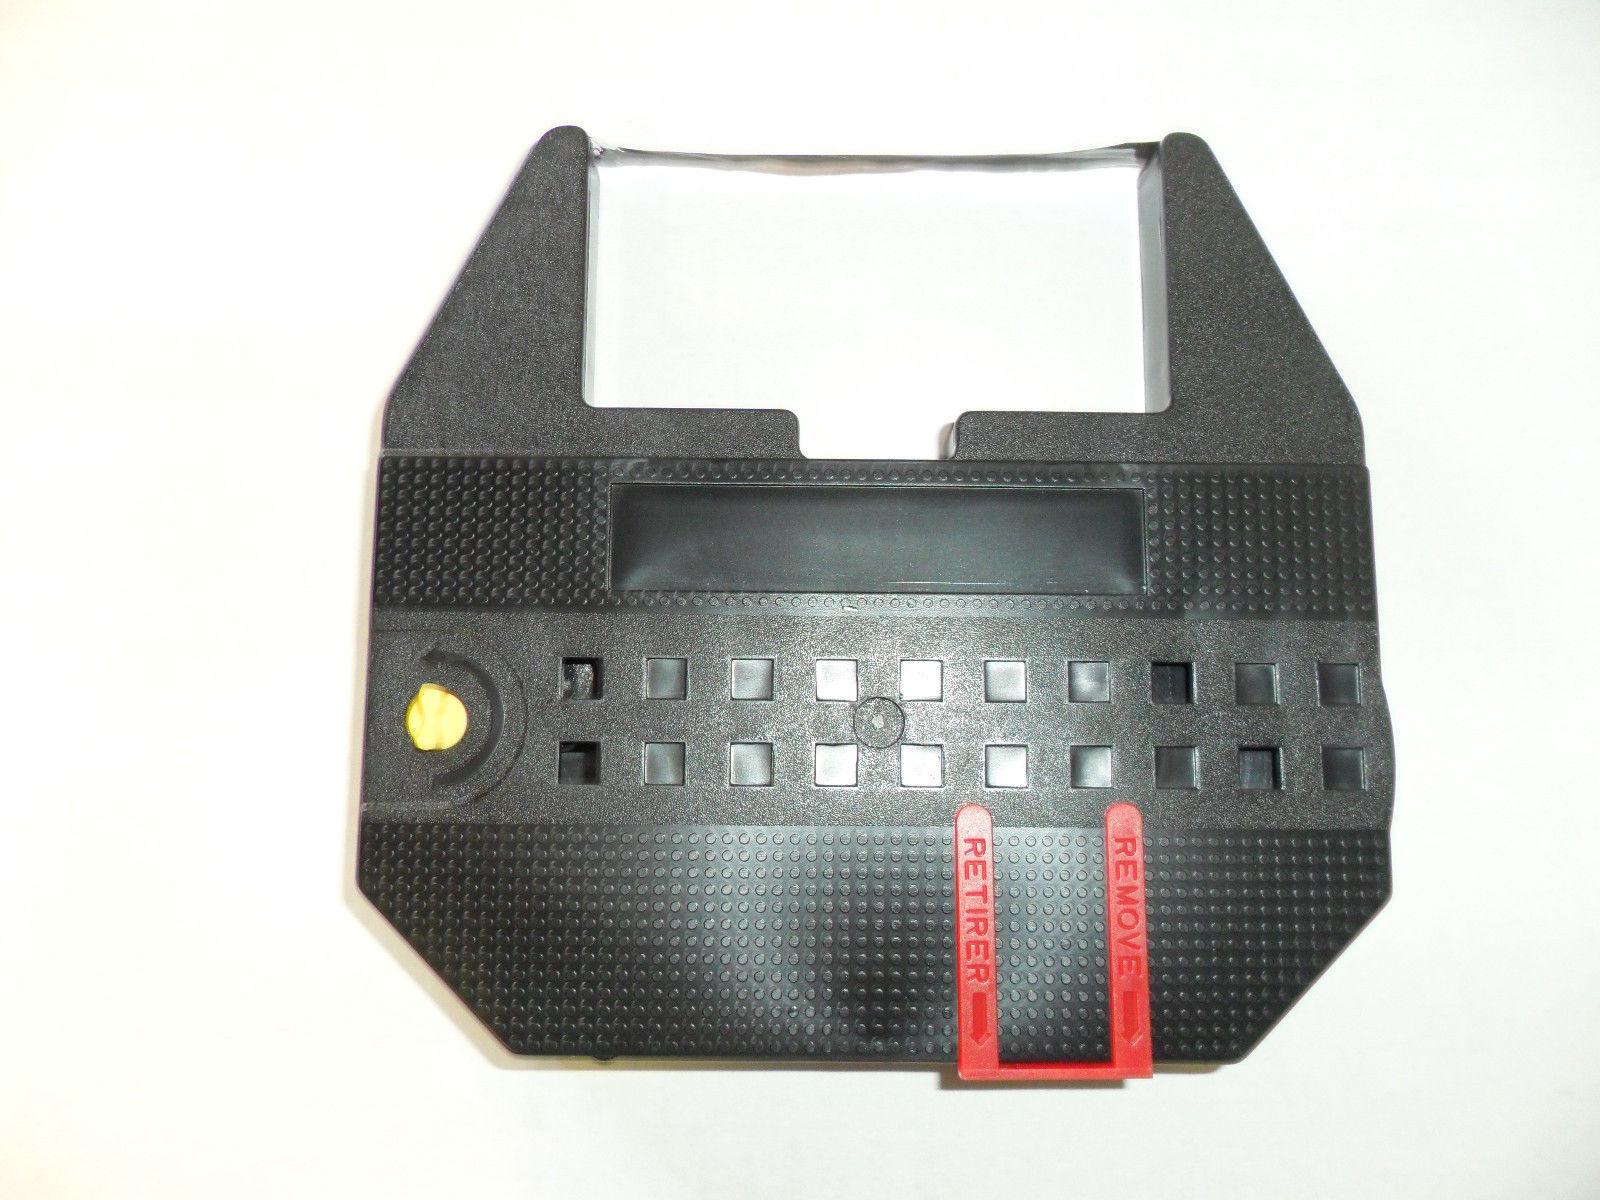 Olivetti PT505 Plus PT505SP PT506 PT506 Plus PT506SP Typewriter Ribbon (2 Pack)